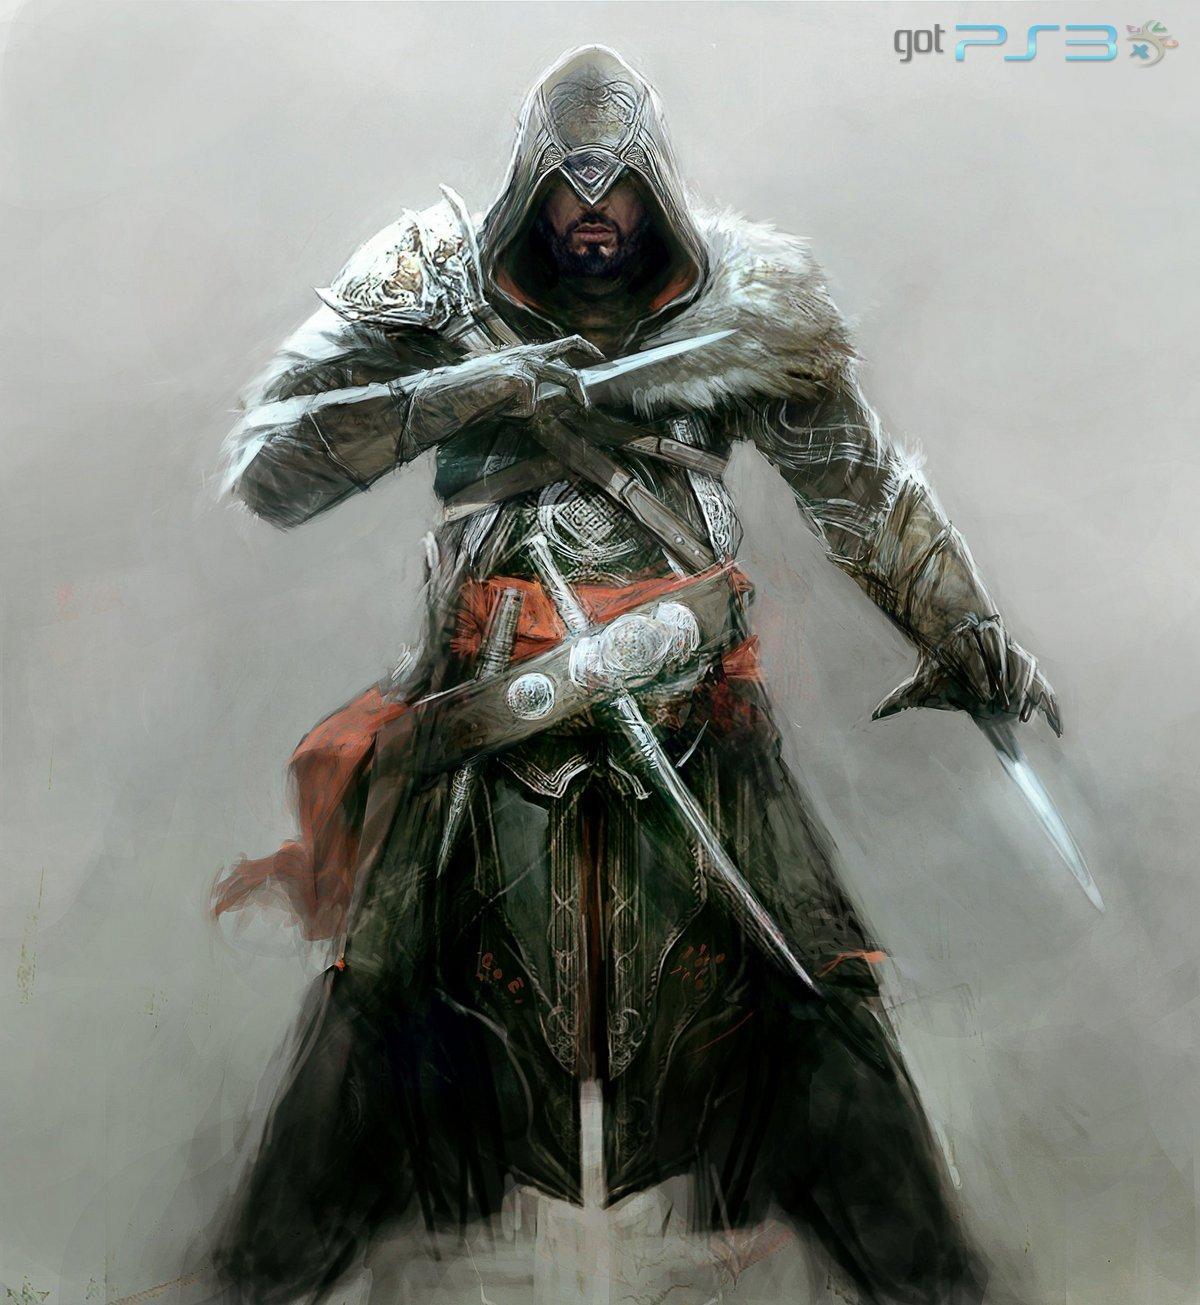 assassin_s_creed_revelations_157227050.jpg - Assassin's Creed: Revelations